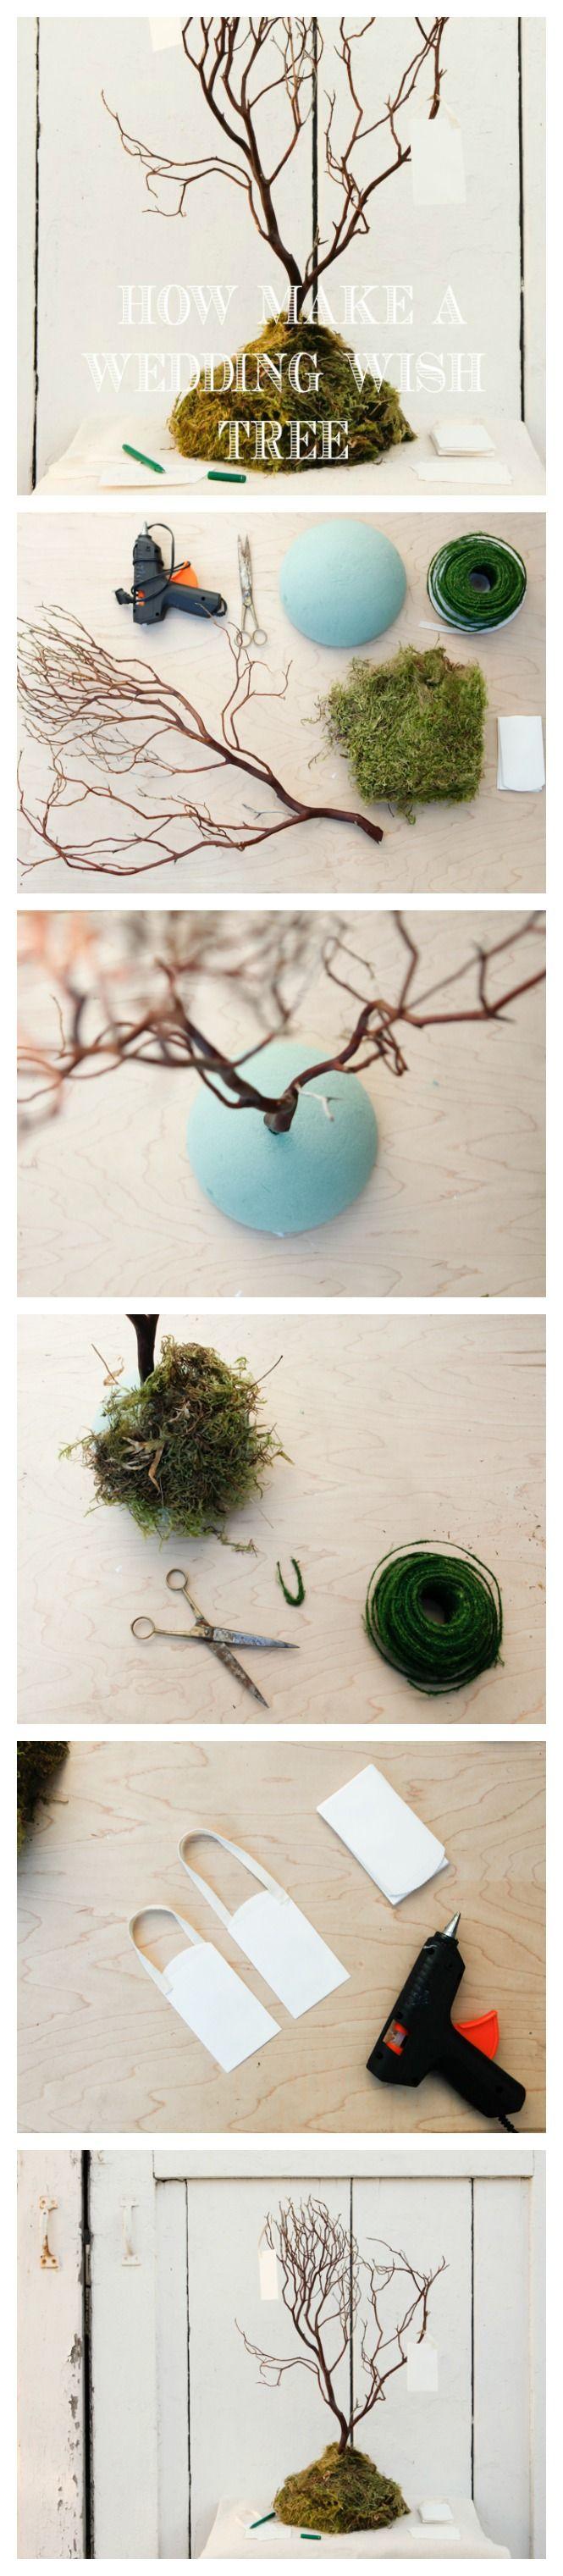 DIY Rustic Wedding Wish Tree | Pinterest | Weddings, Centerpieces ...